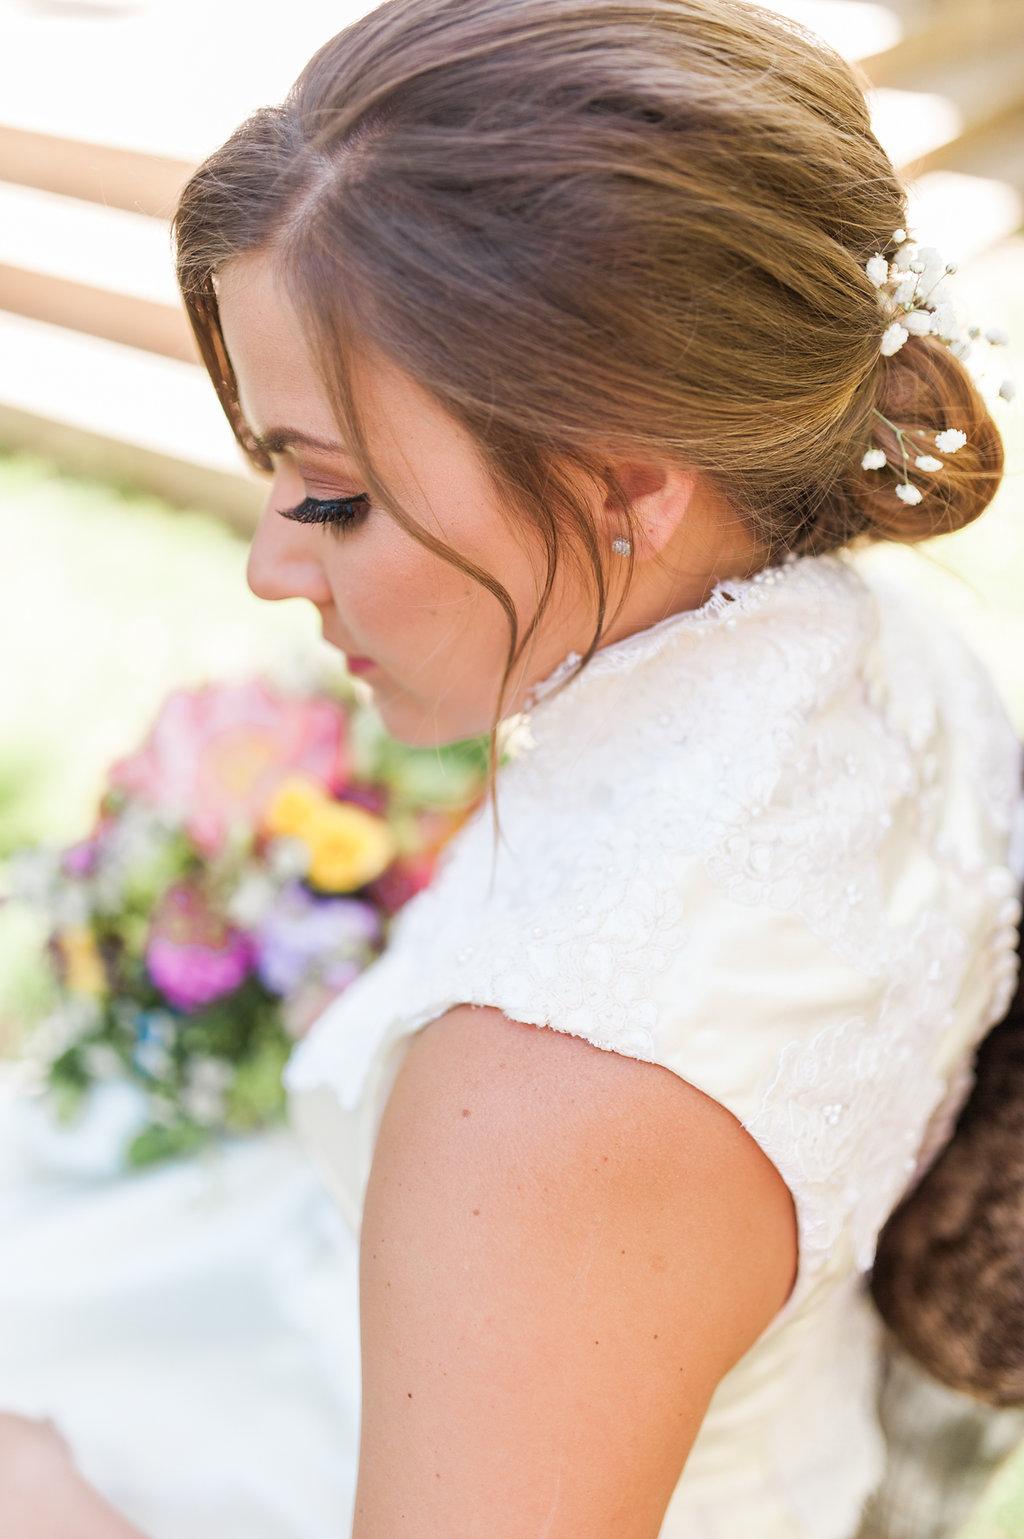 Bridal Bun Hairstyles - Iowa Farm Wedding - Private Estate Weddings